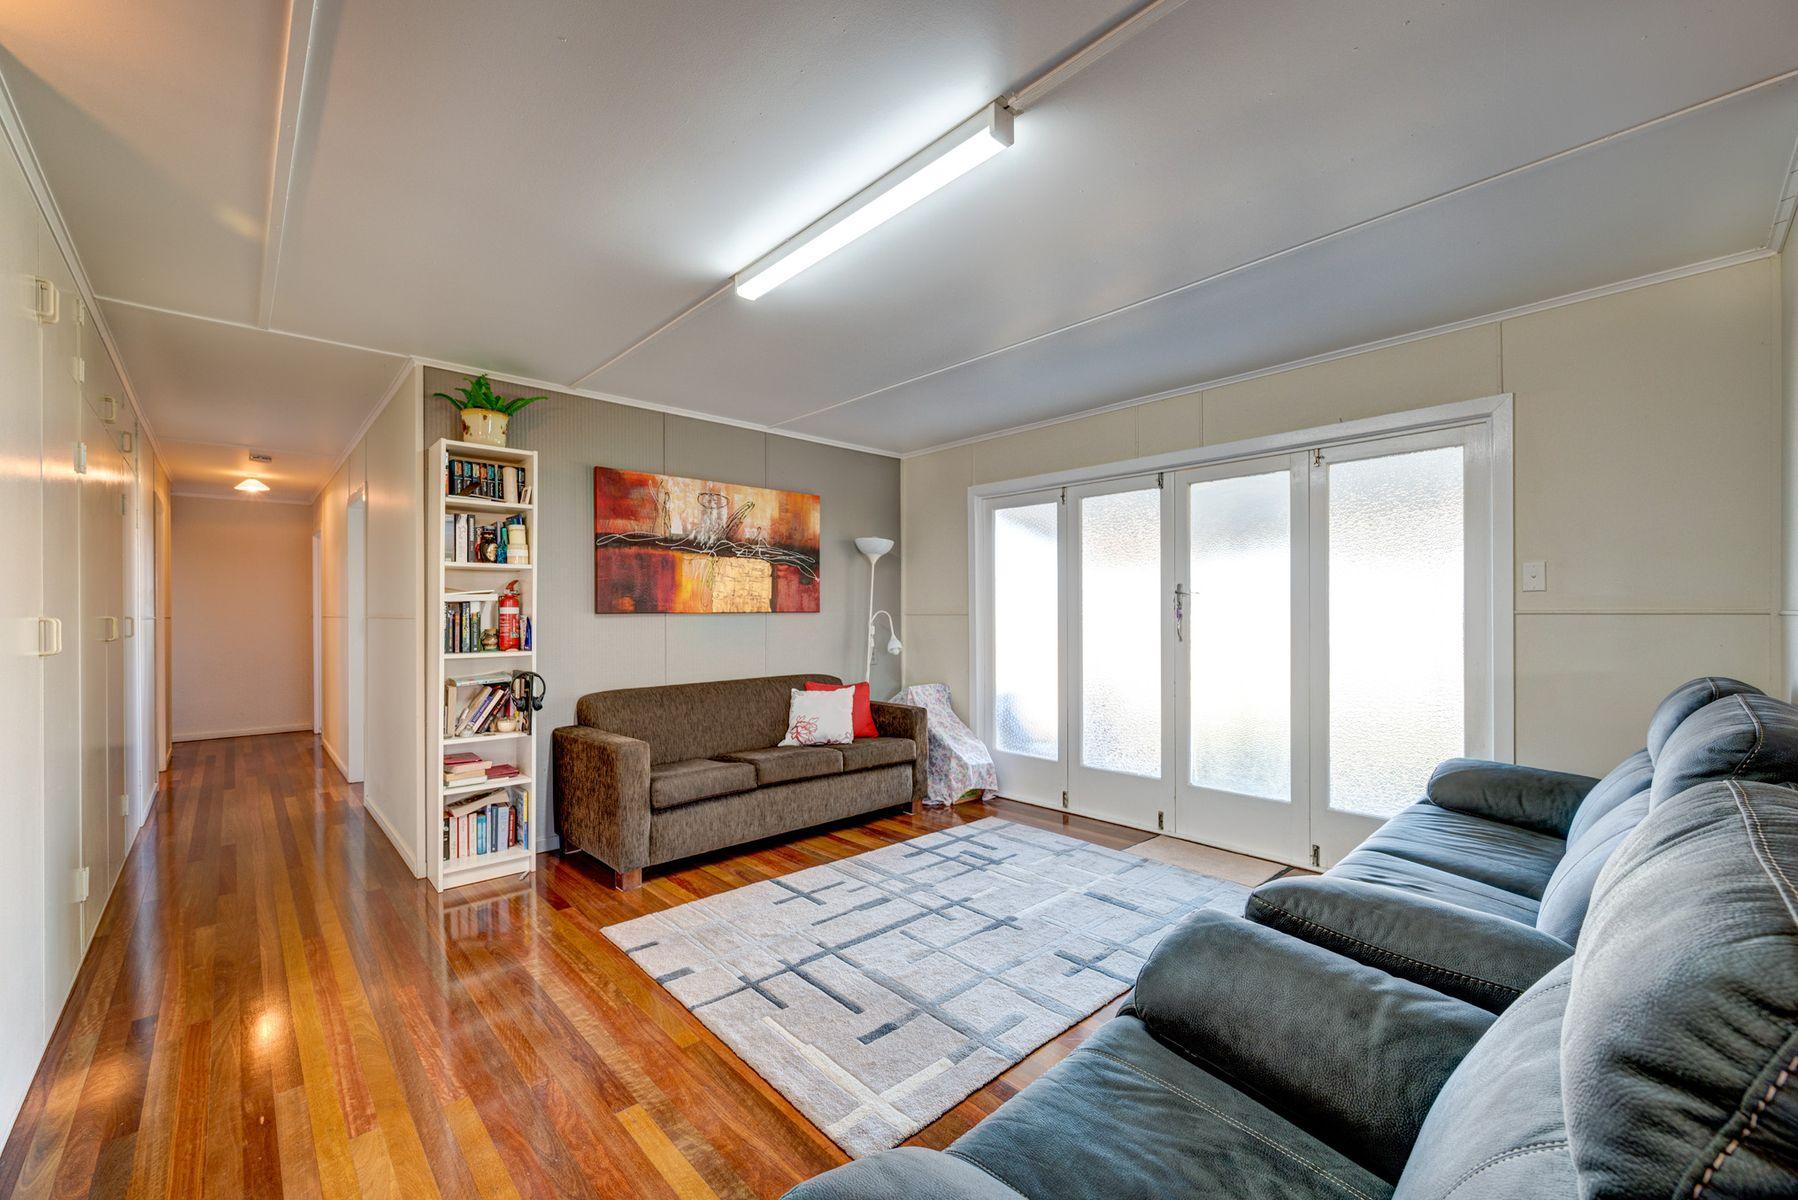 63 Loeskow Street, Gooburrum, QLD 4670